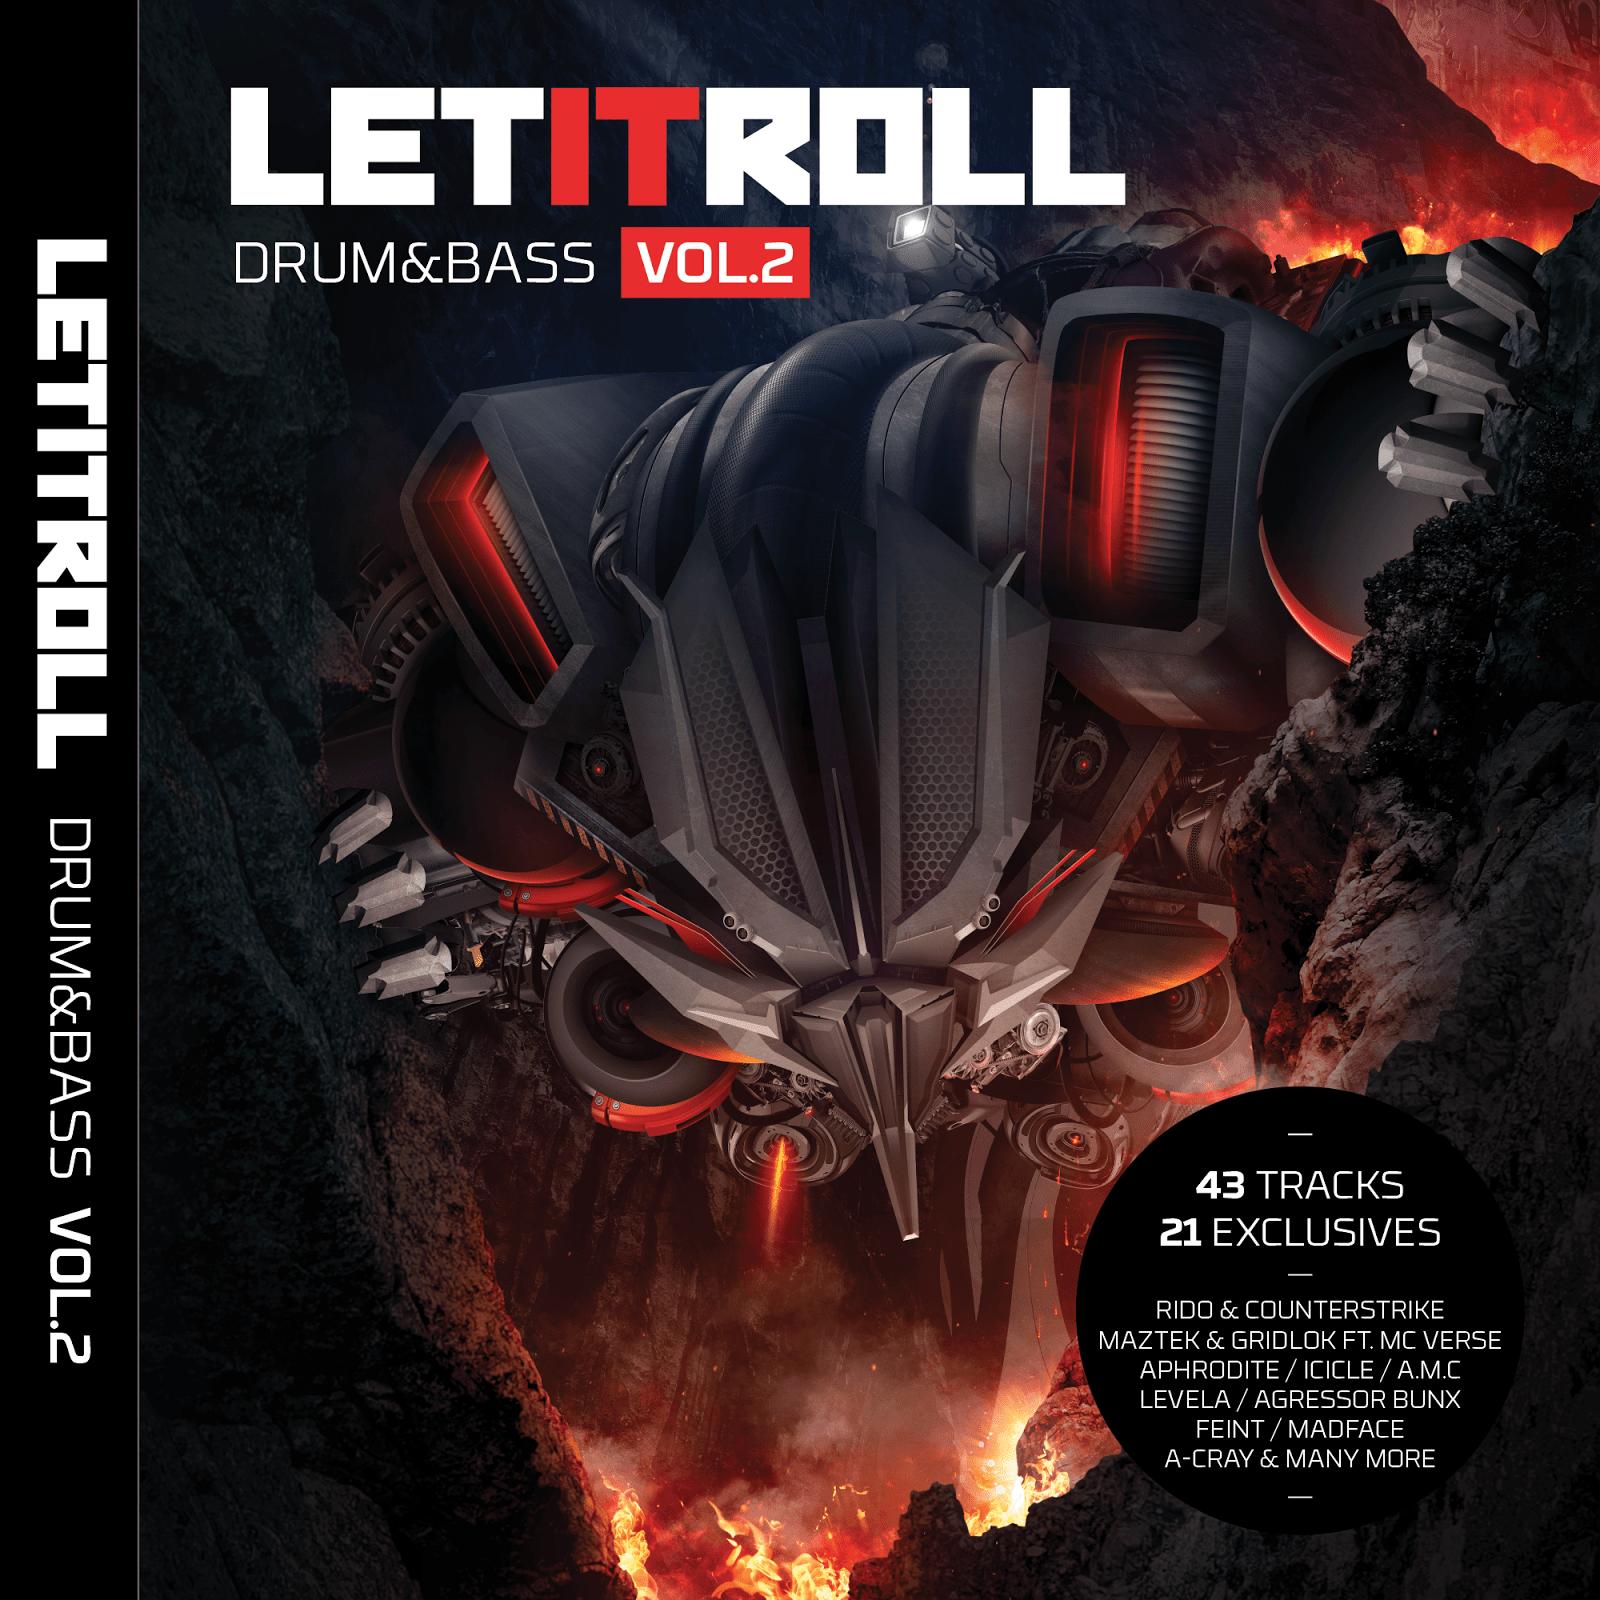 letitroll_drumbass_vol2.png